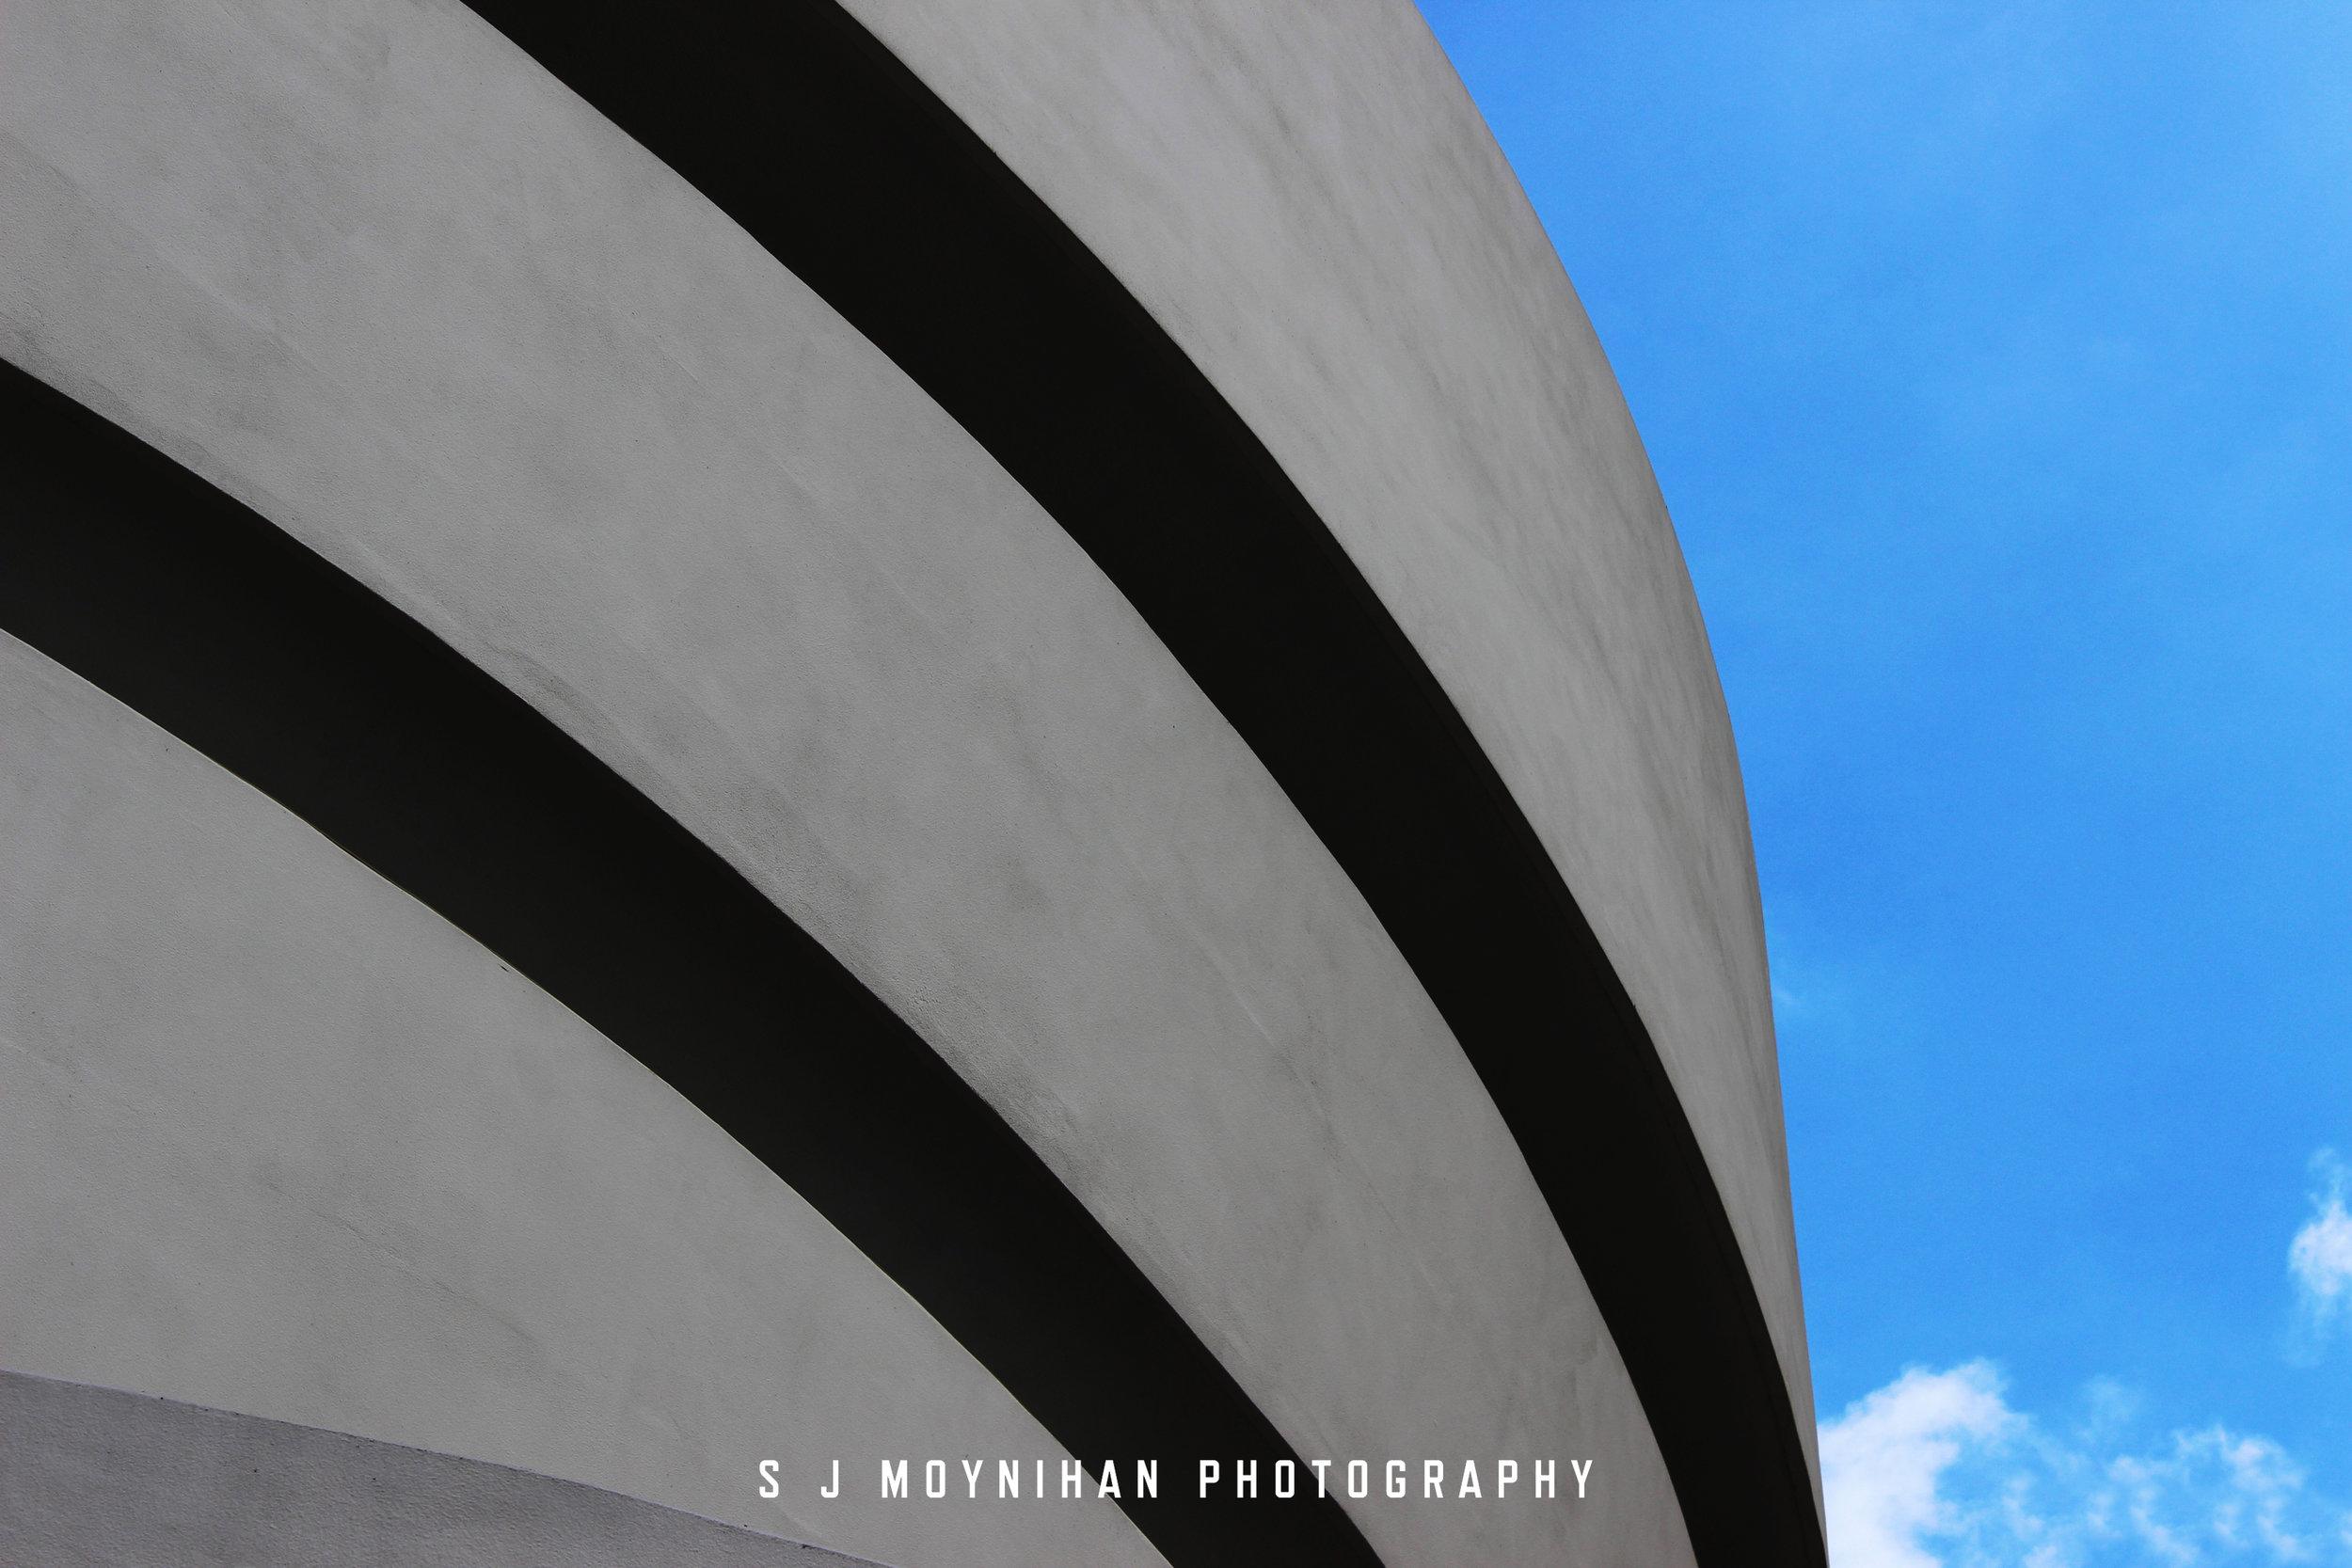 Guggenheim-2.jpg